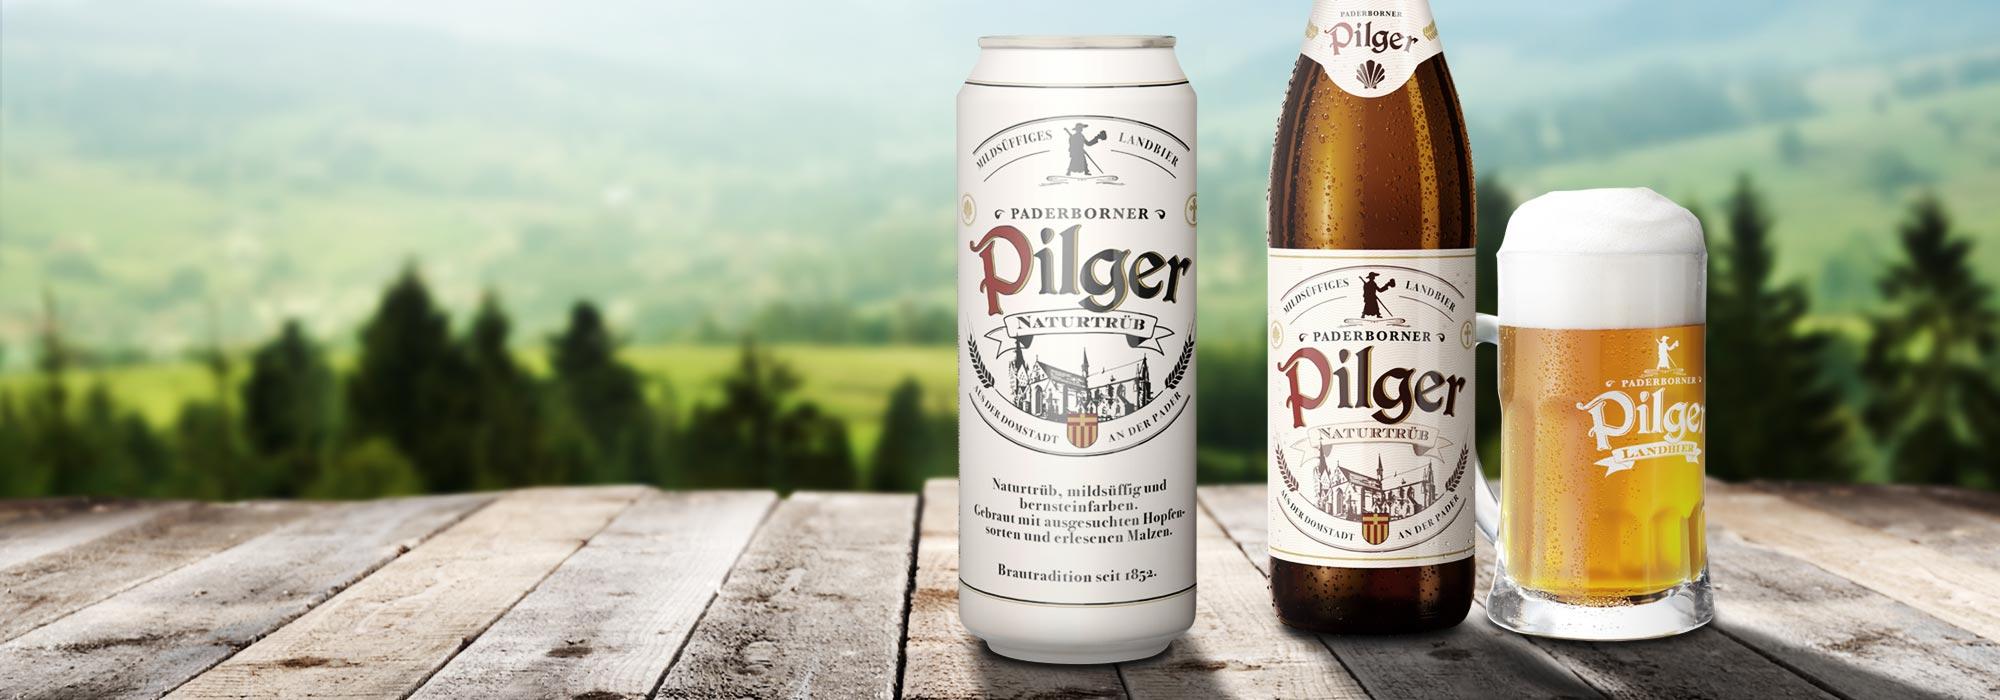 Paderborner Pilger Etikett